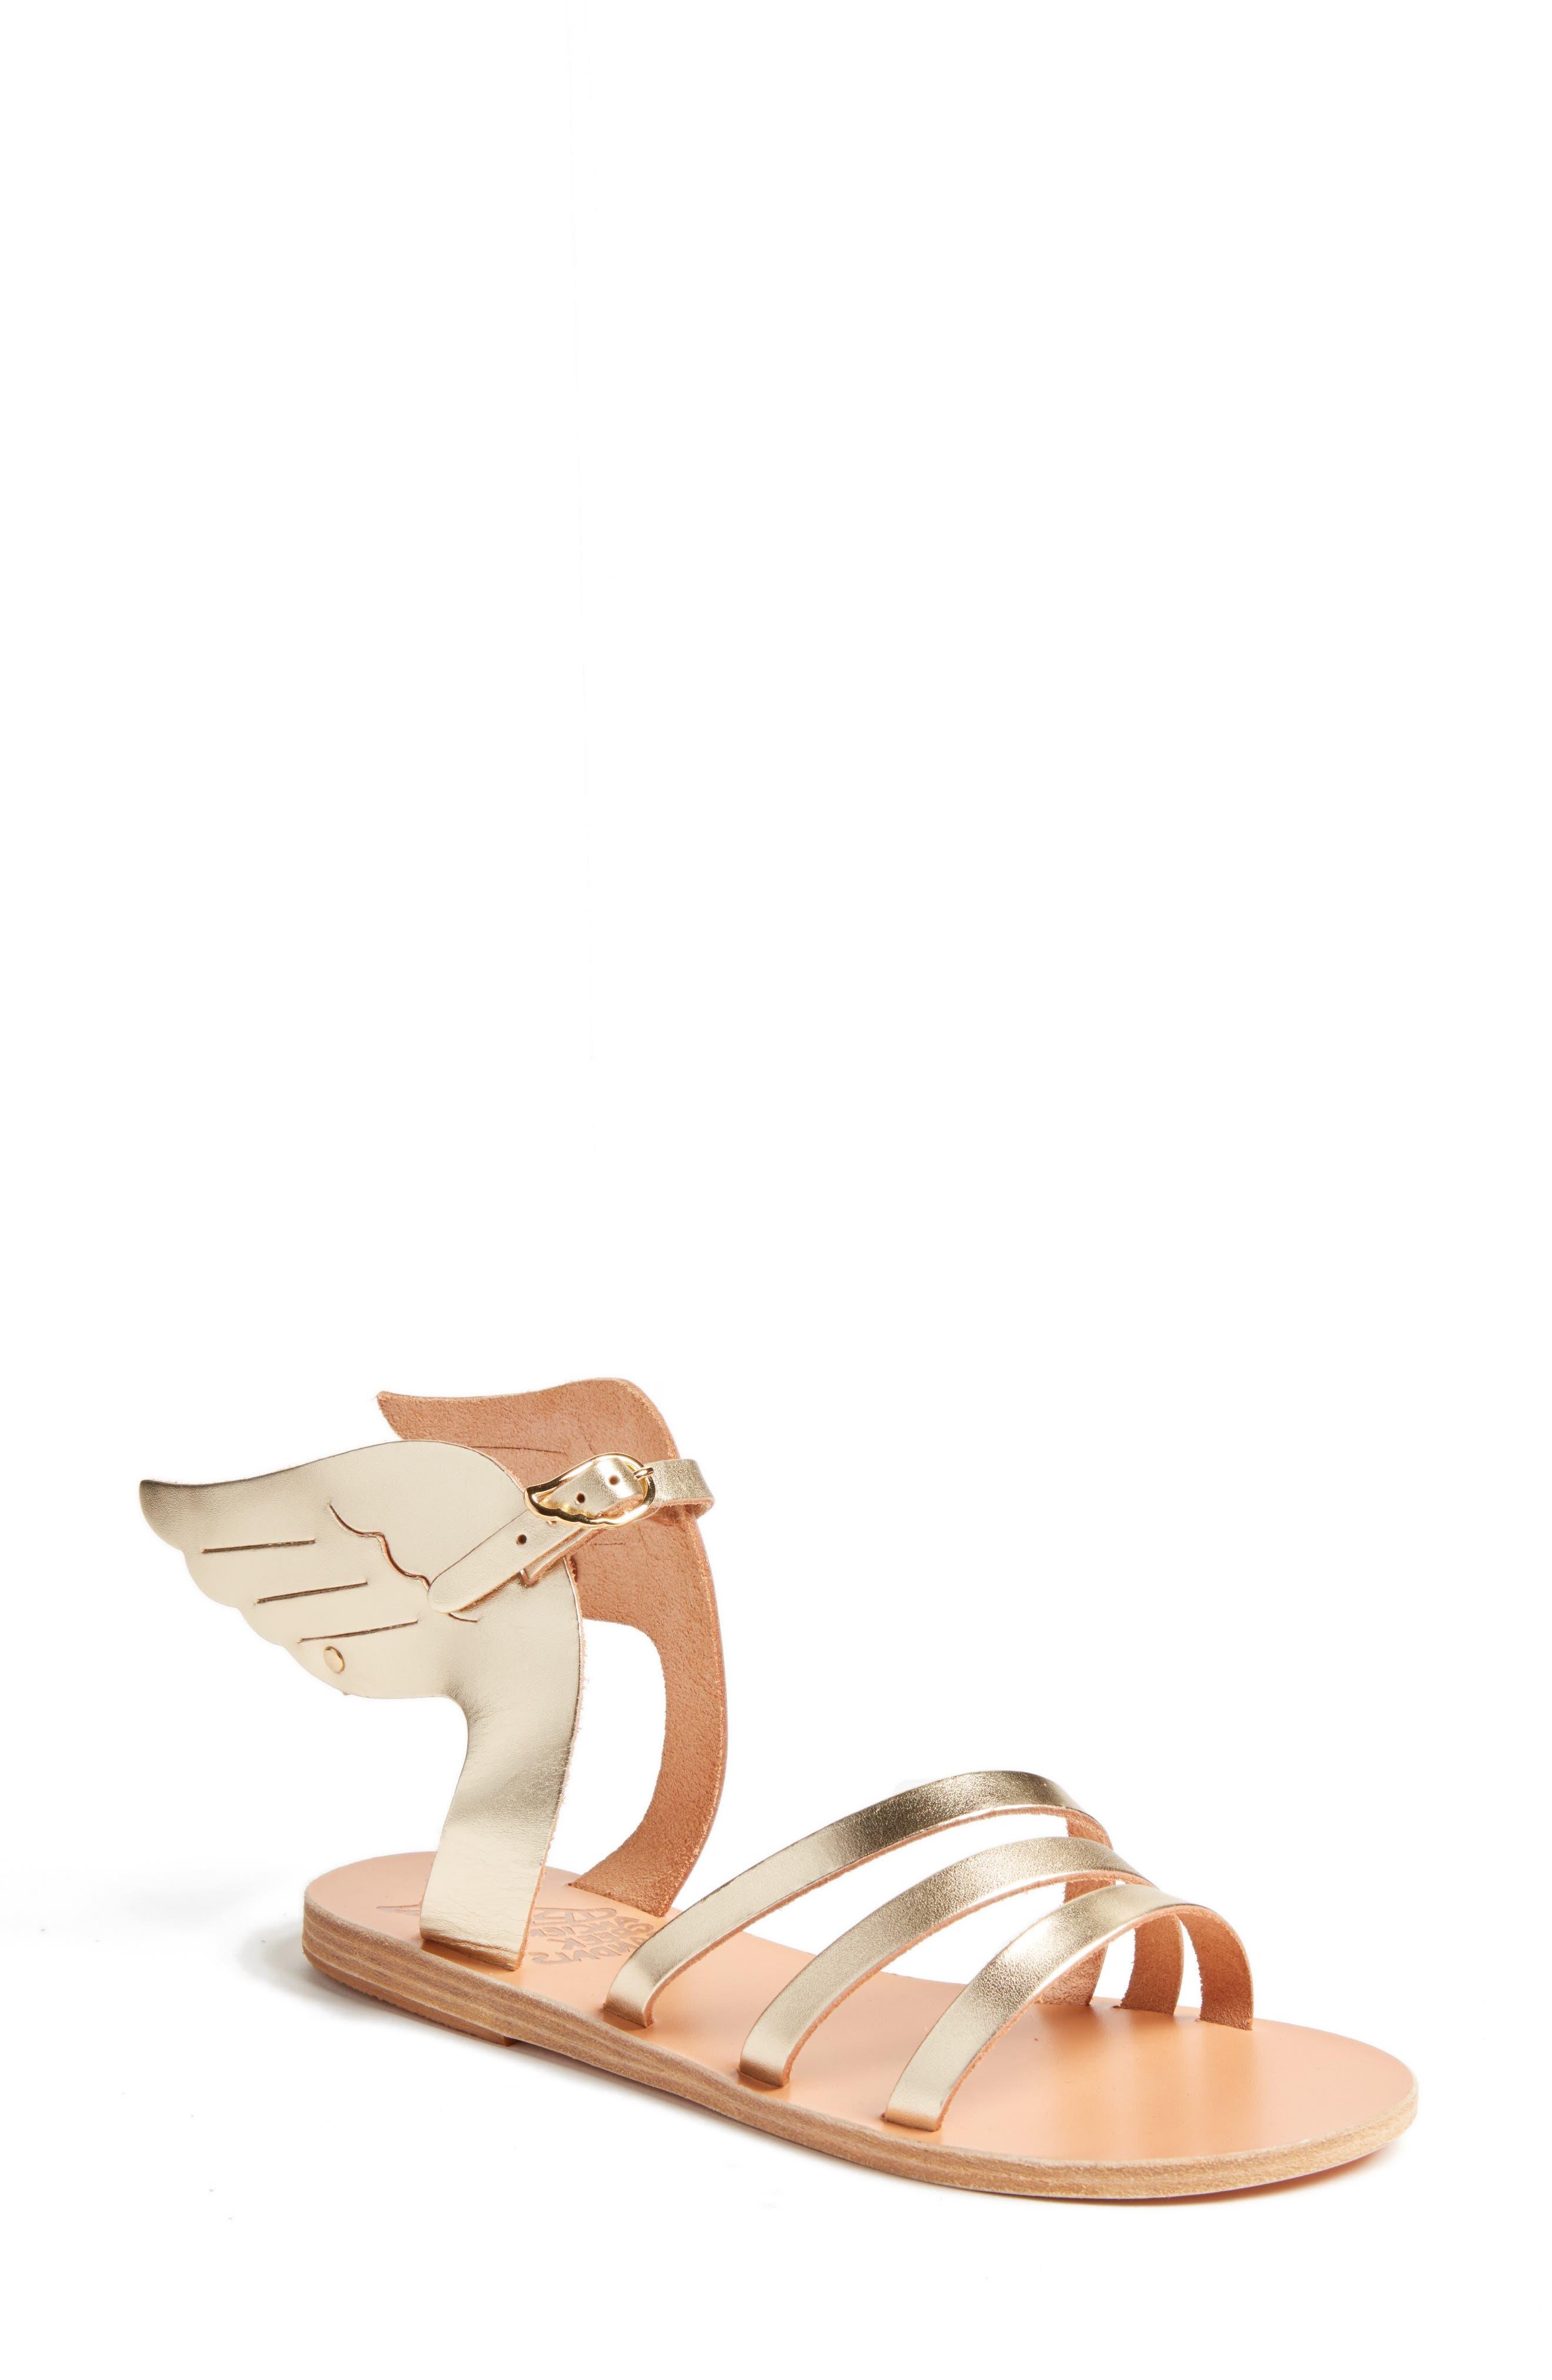 Alternate Image 1 Selected - Ancient Greek Sandals Ikaria Sandal (Women)